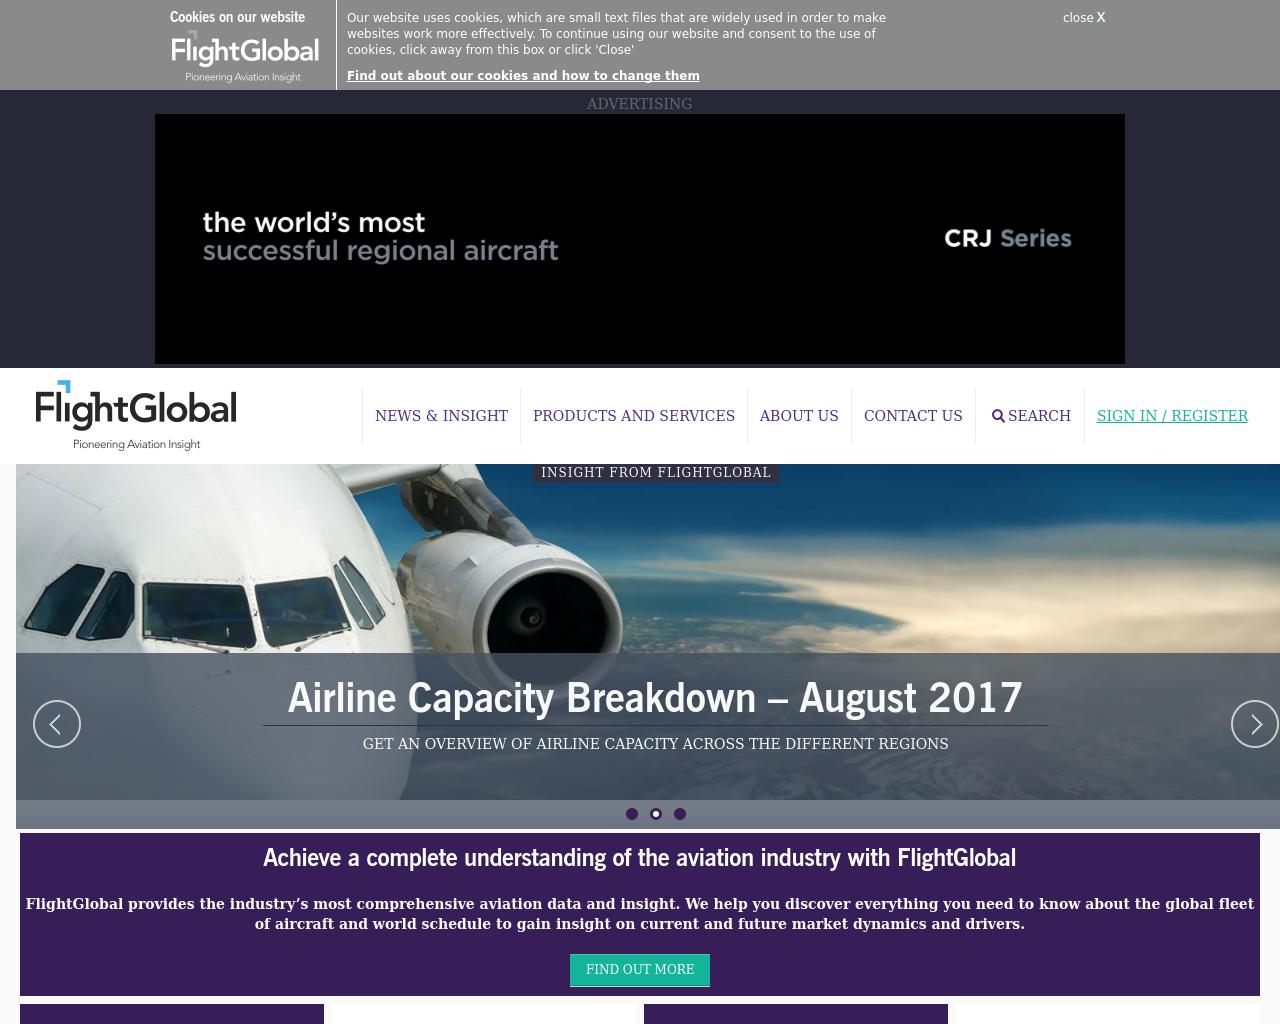 Flightglobal-Advertising-Reviews-Pricing